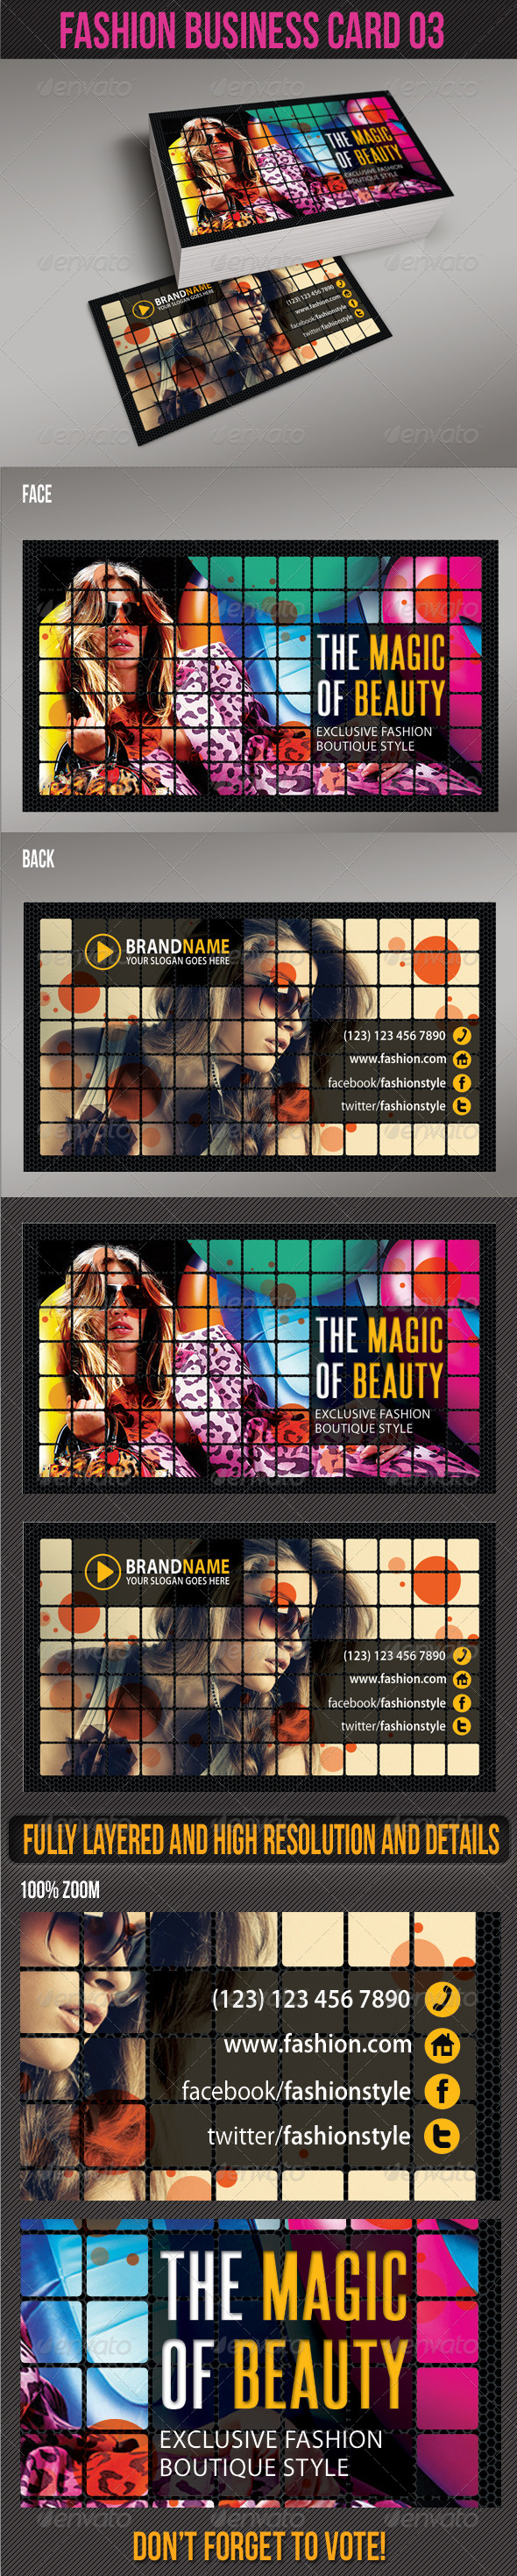 Fashion Business Card 03 - Creative Business Cards